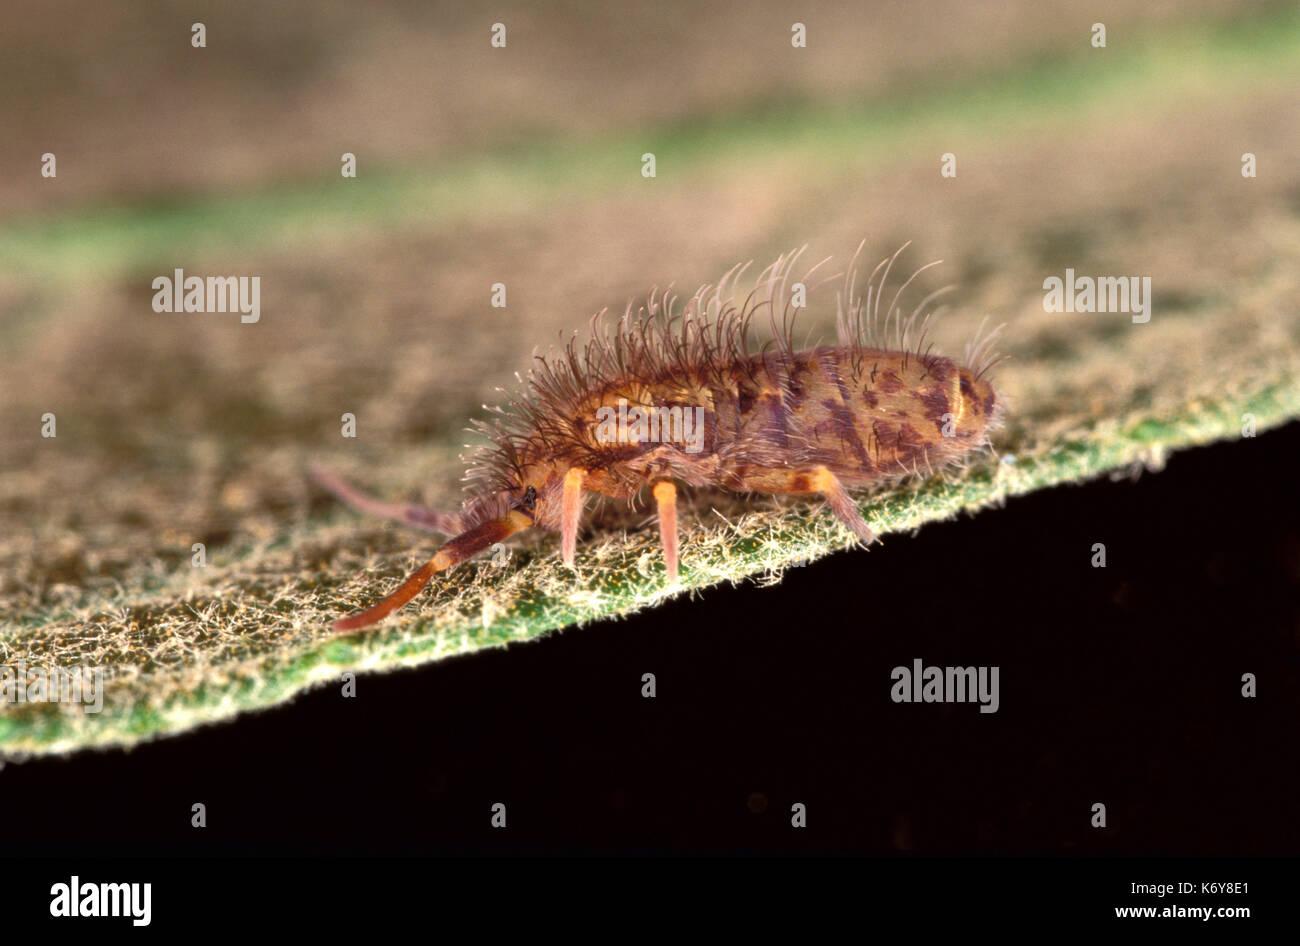 Hexapod Invertebrates Stock Photos & Hexapod Invertebrates